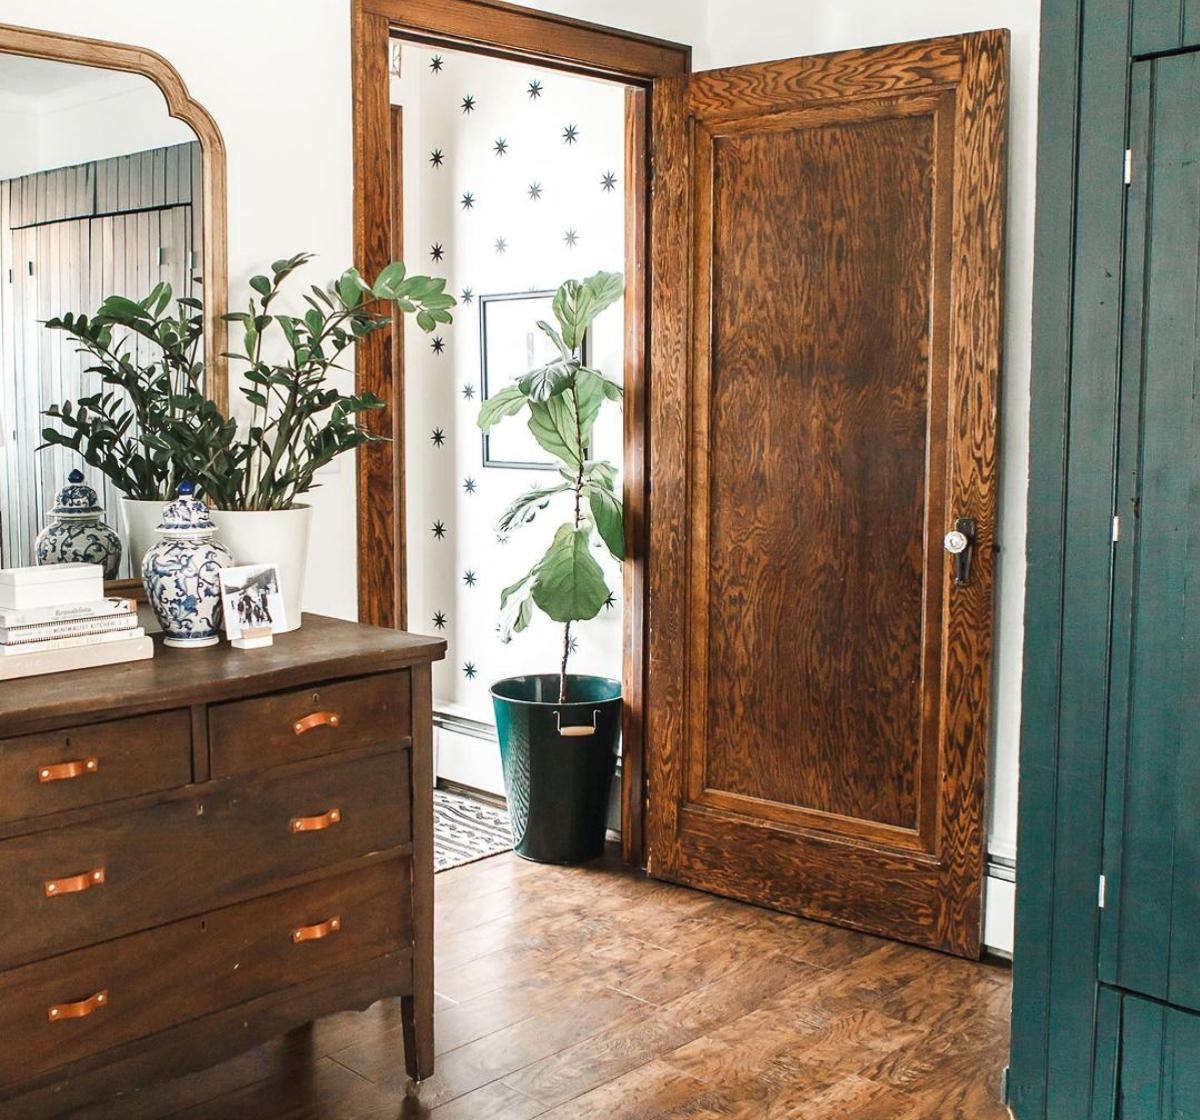 Love this charming old home with original oak doors kellyelko.com